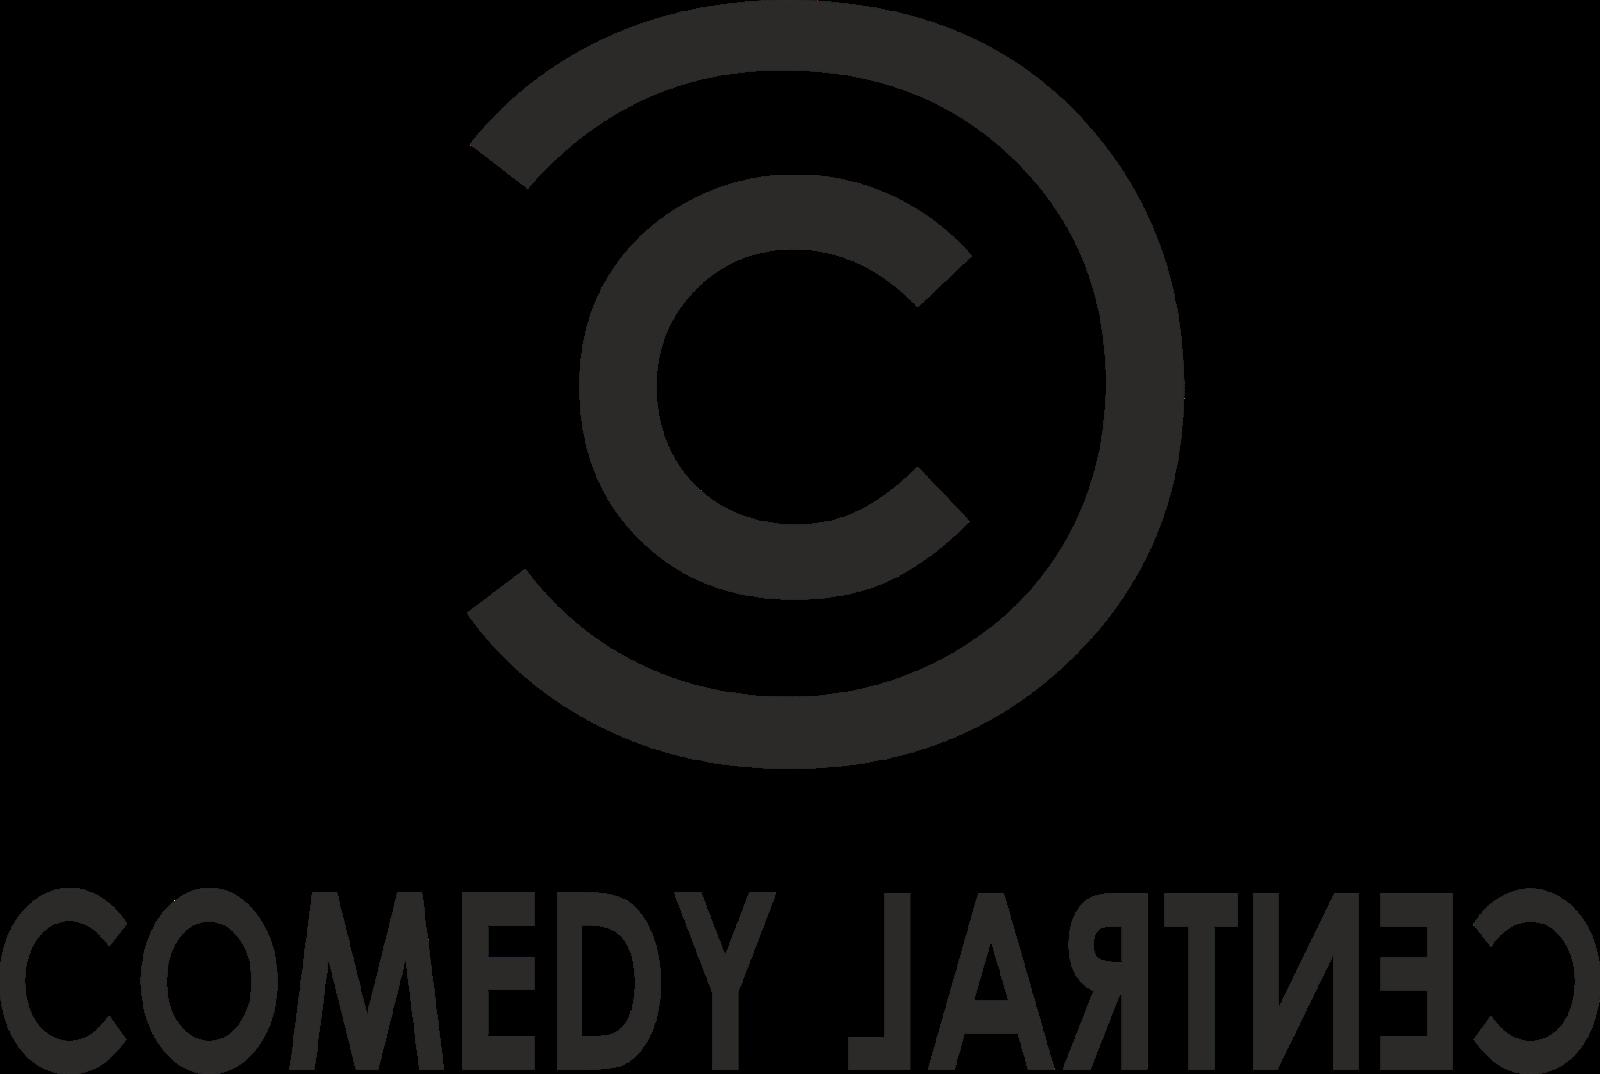 Comedy Central Tv